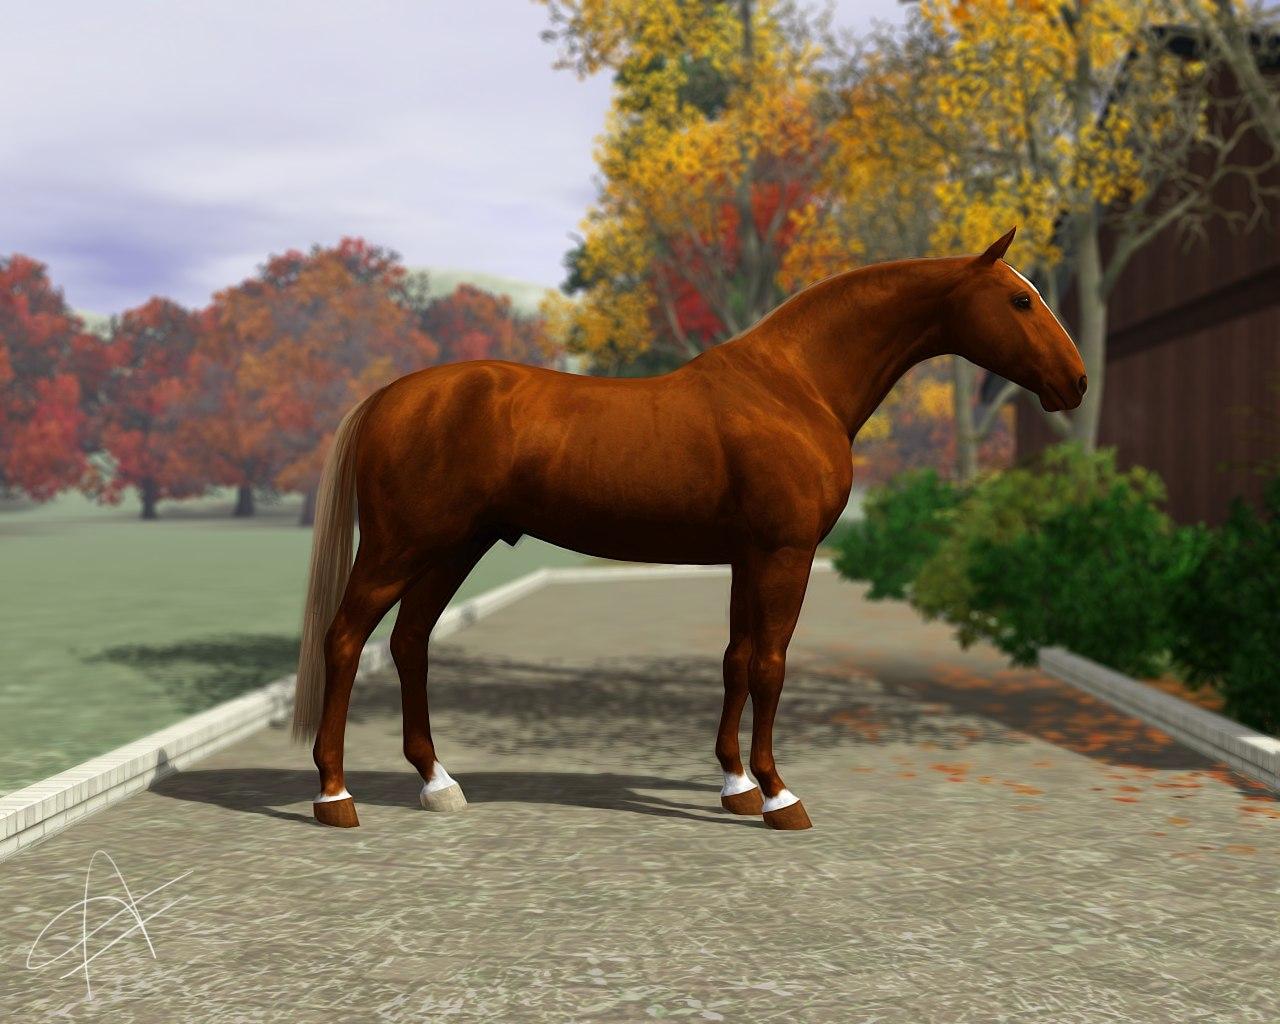 Регистрация лошадей в RHF 2 - Страница 5 FkAaUjljXKQ